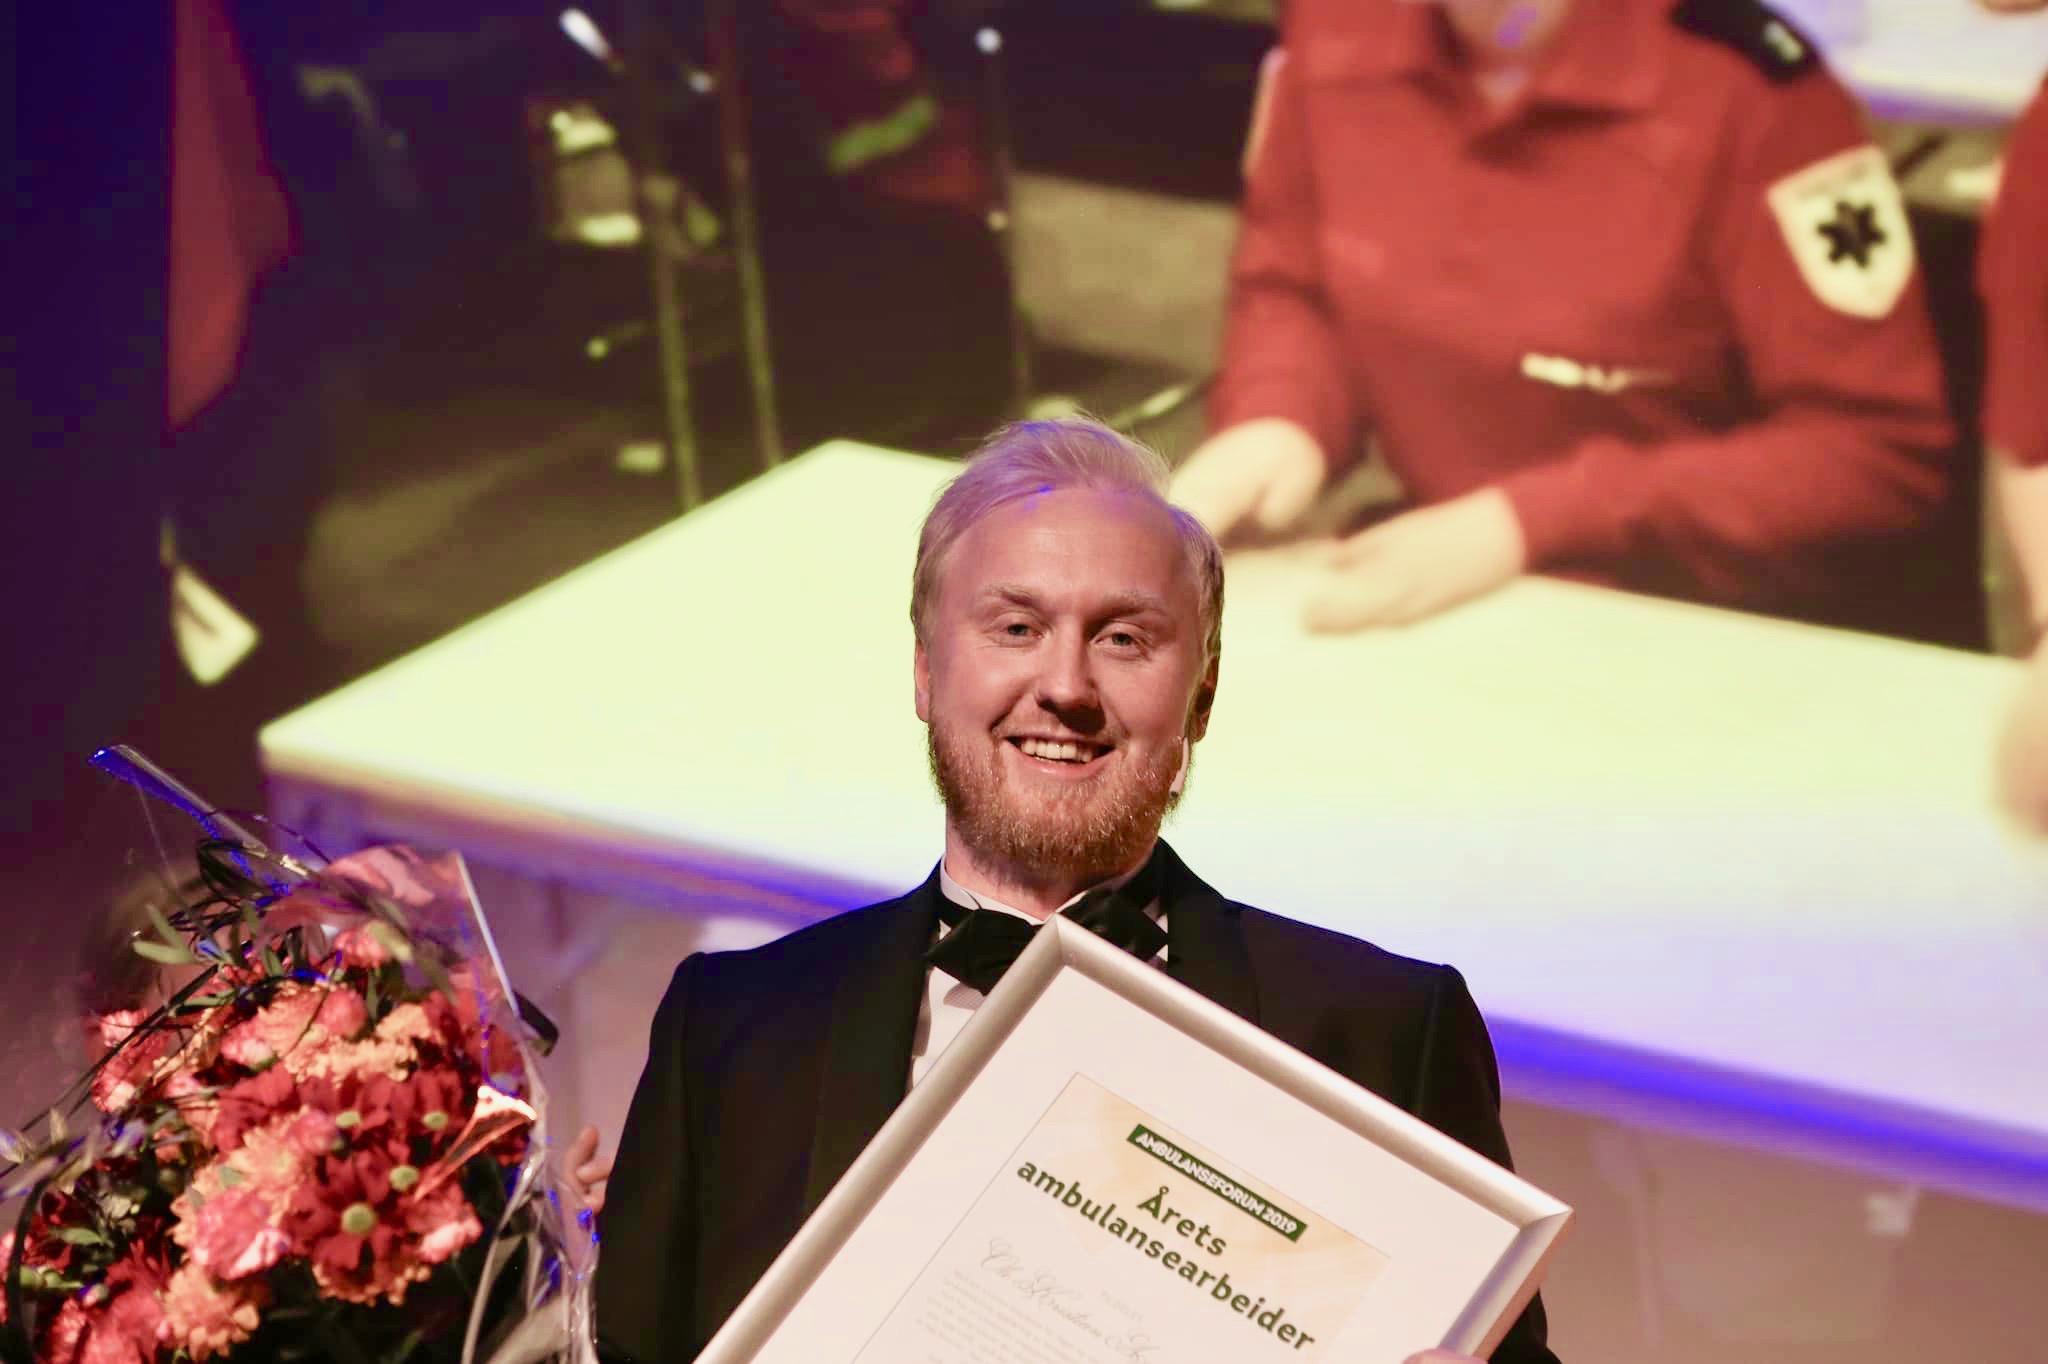 Årets ambulansearbeider 2019 er Ole Kristian Andreassen. Foto: Tor Aage Hansen